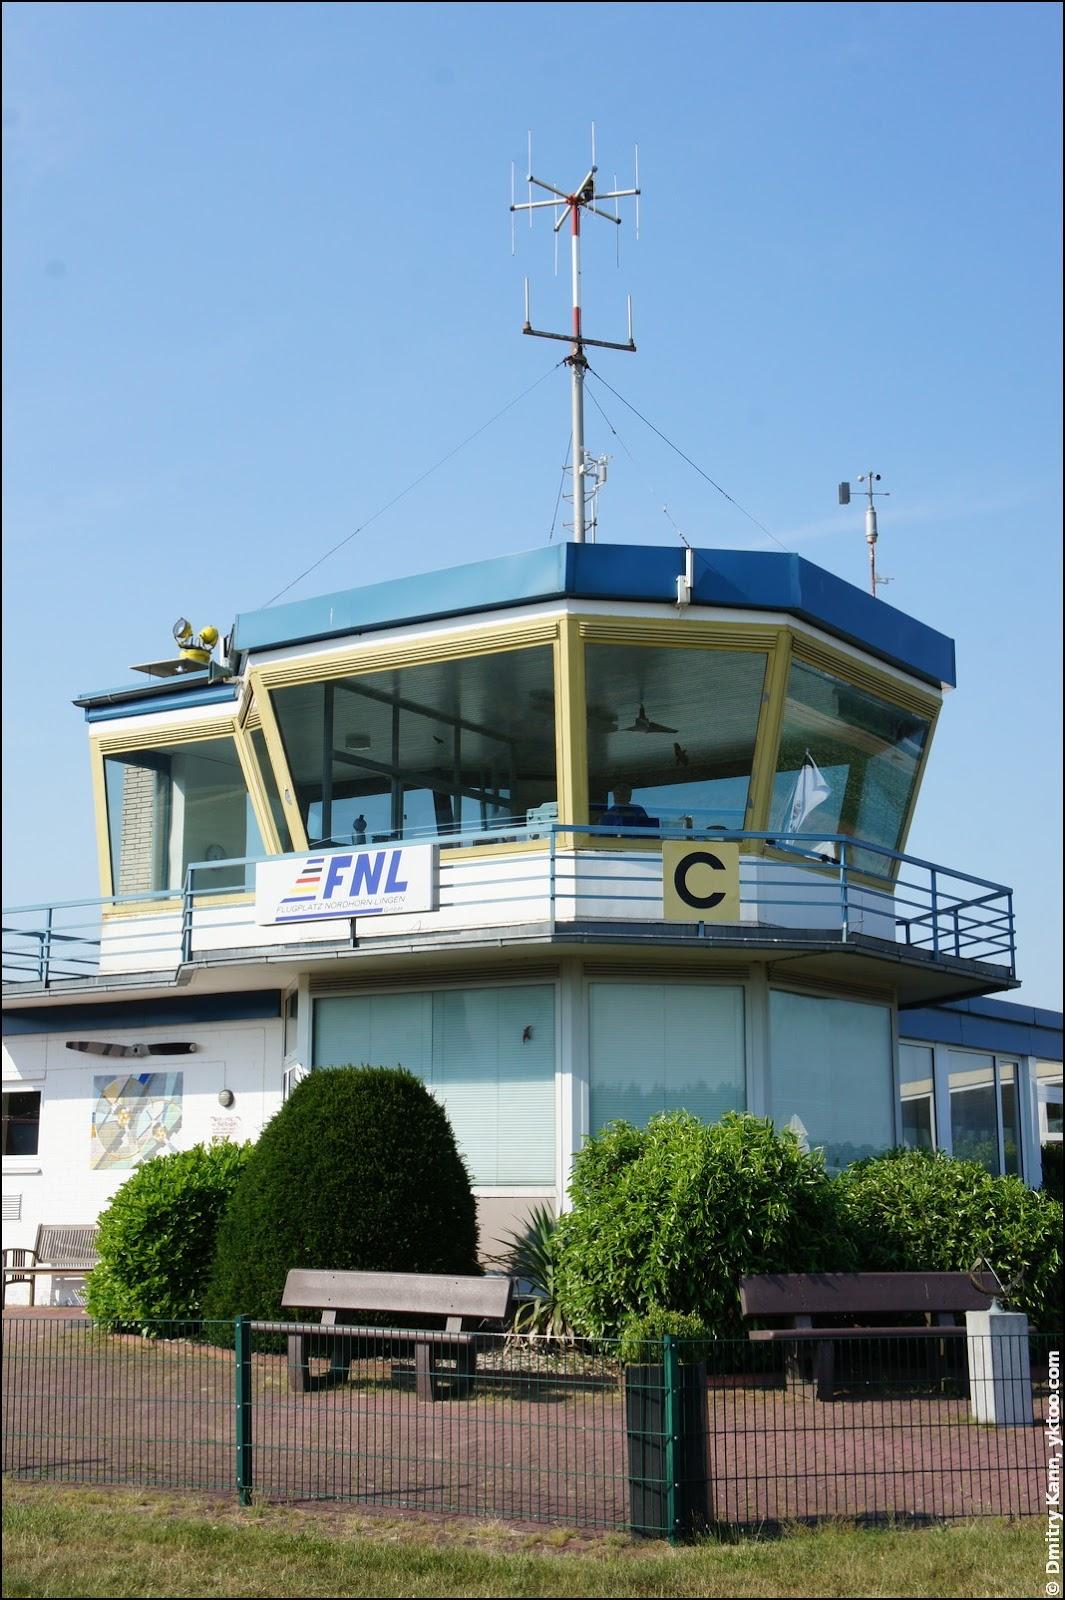 Nordhorn ATC tower.